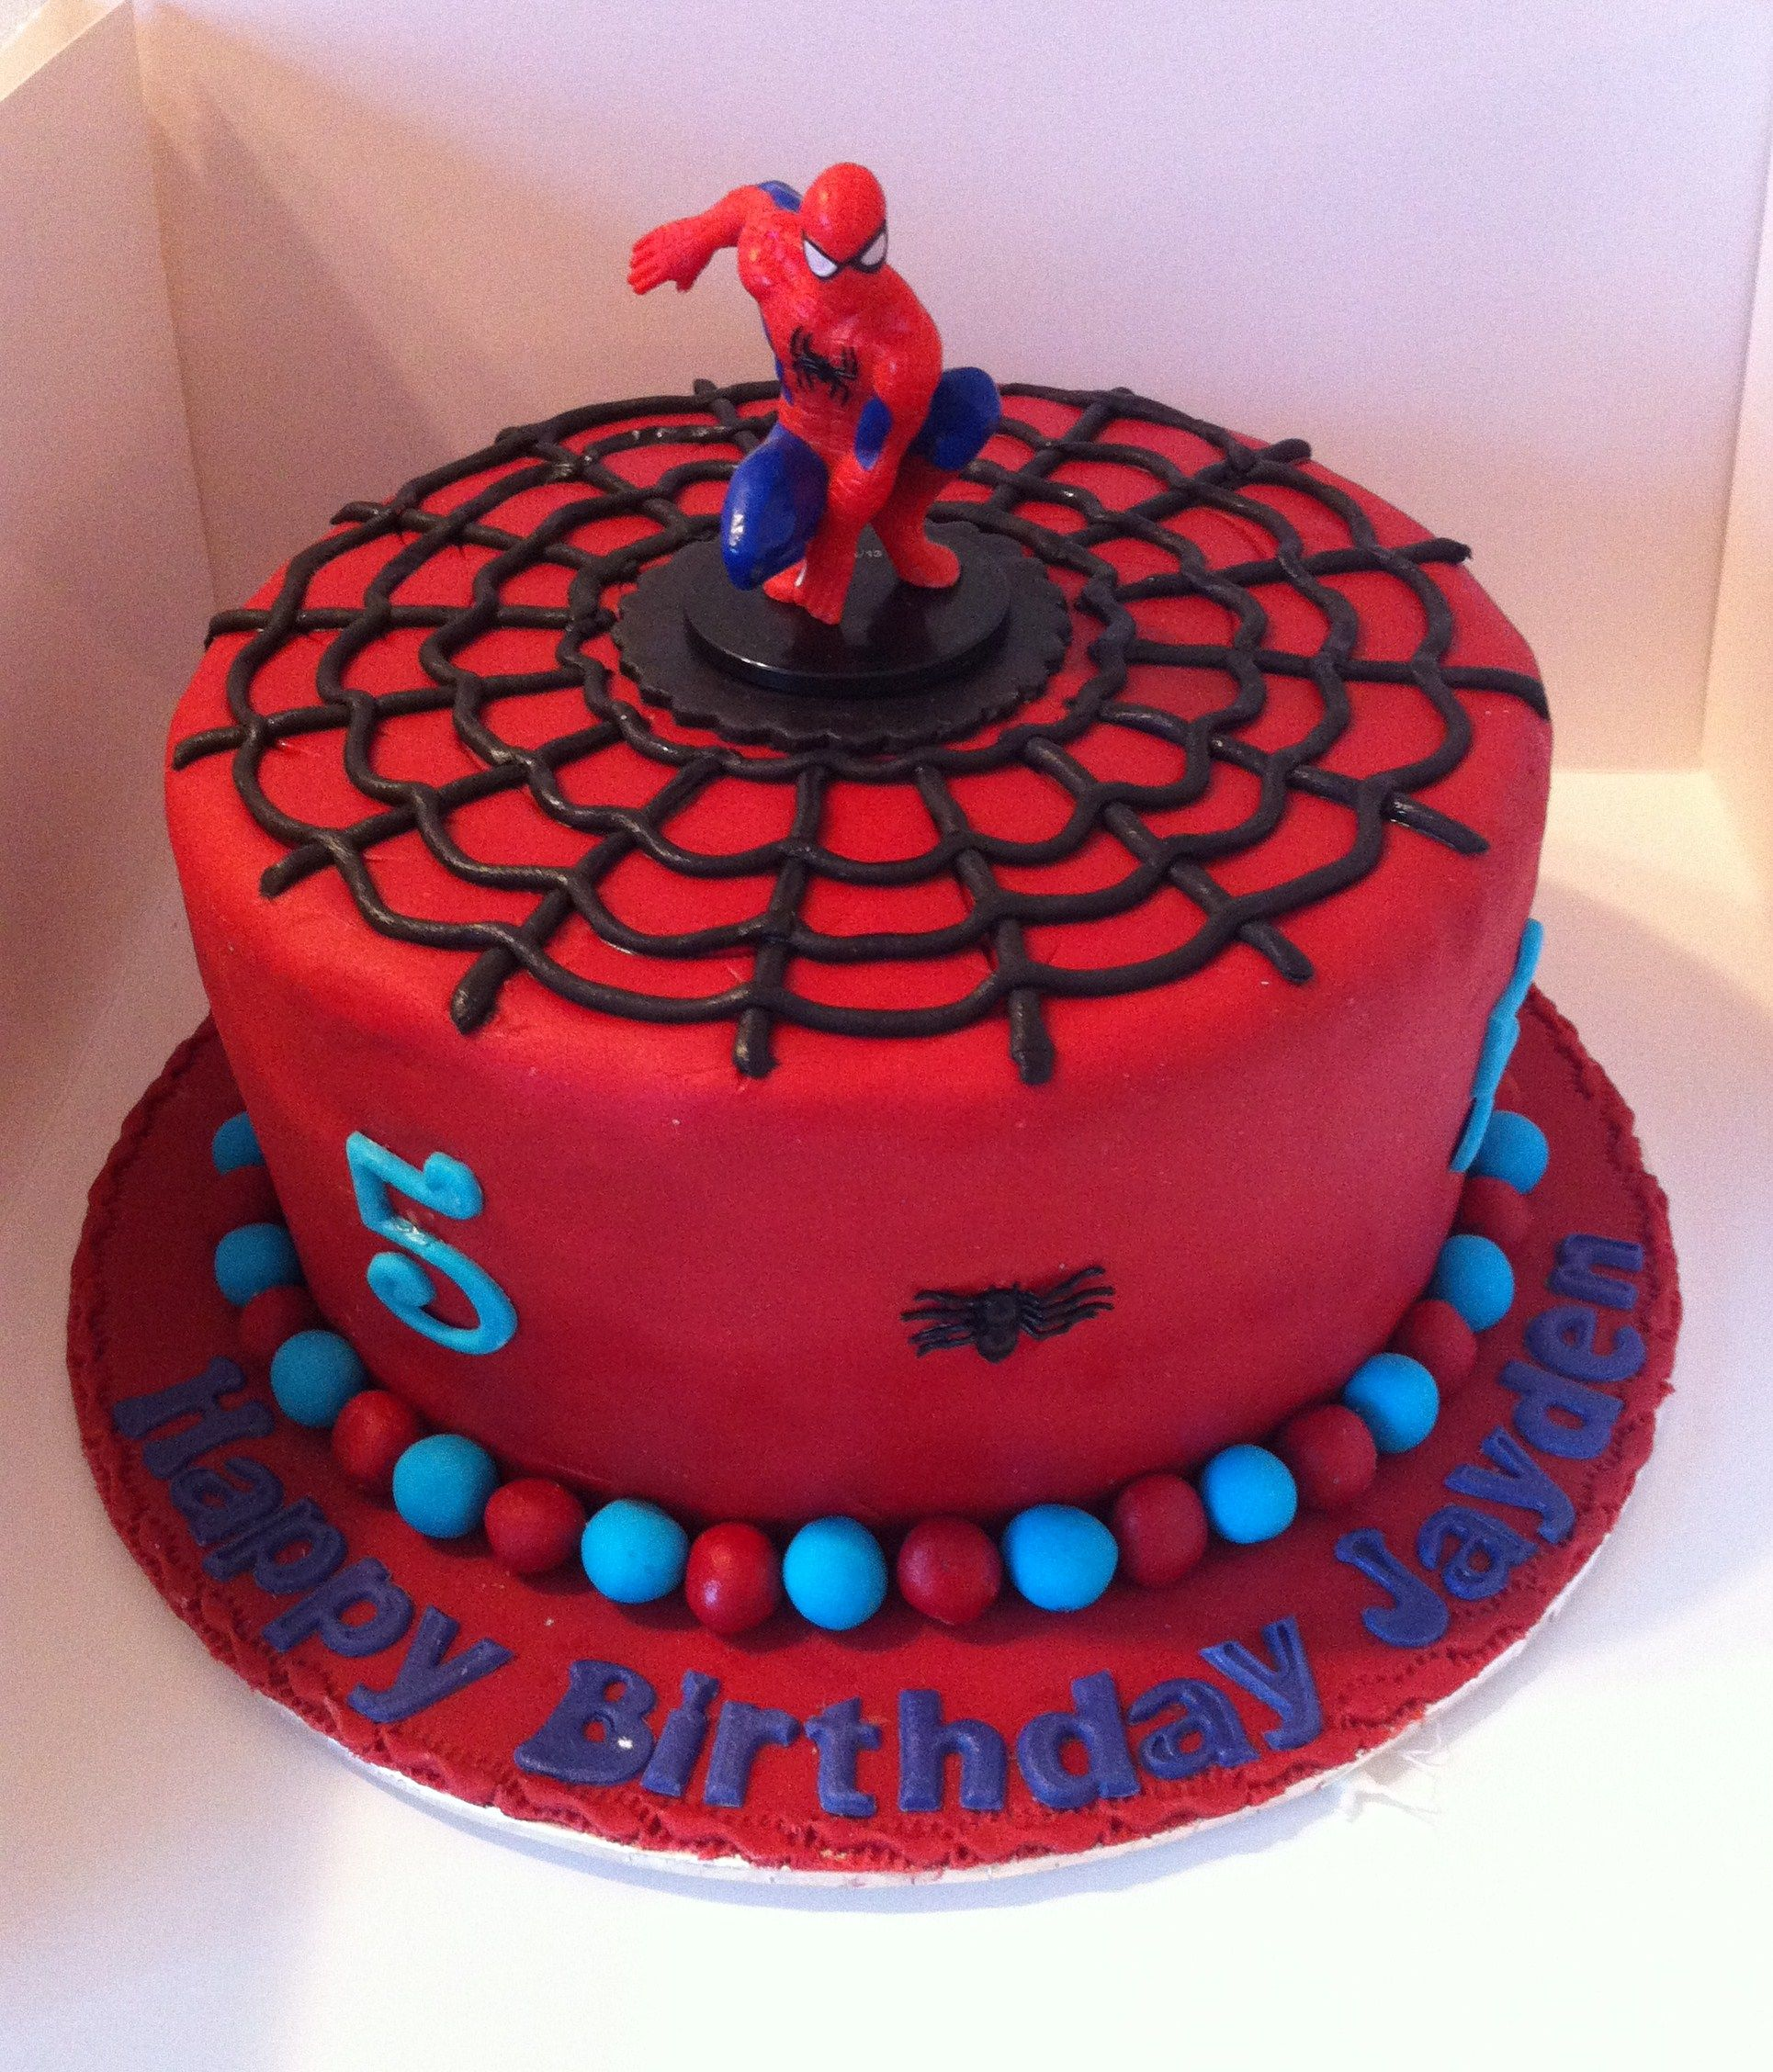 Tremendous Spiderman Cake Spiderman Birthday Cake Birthday Cake Kids Funny Birthday Cards Online Alyptdamsfinfo